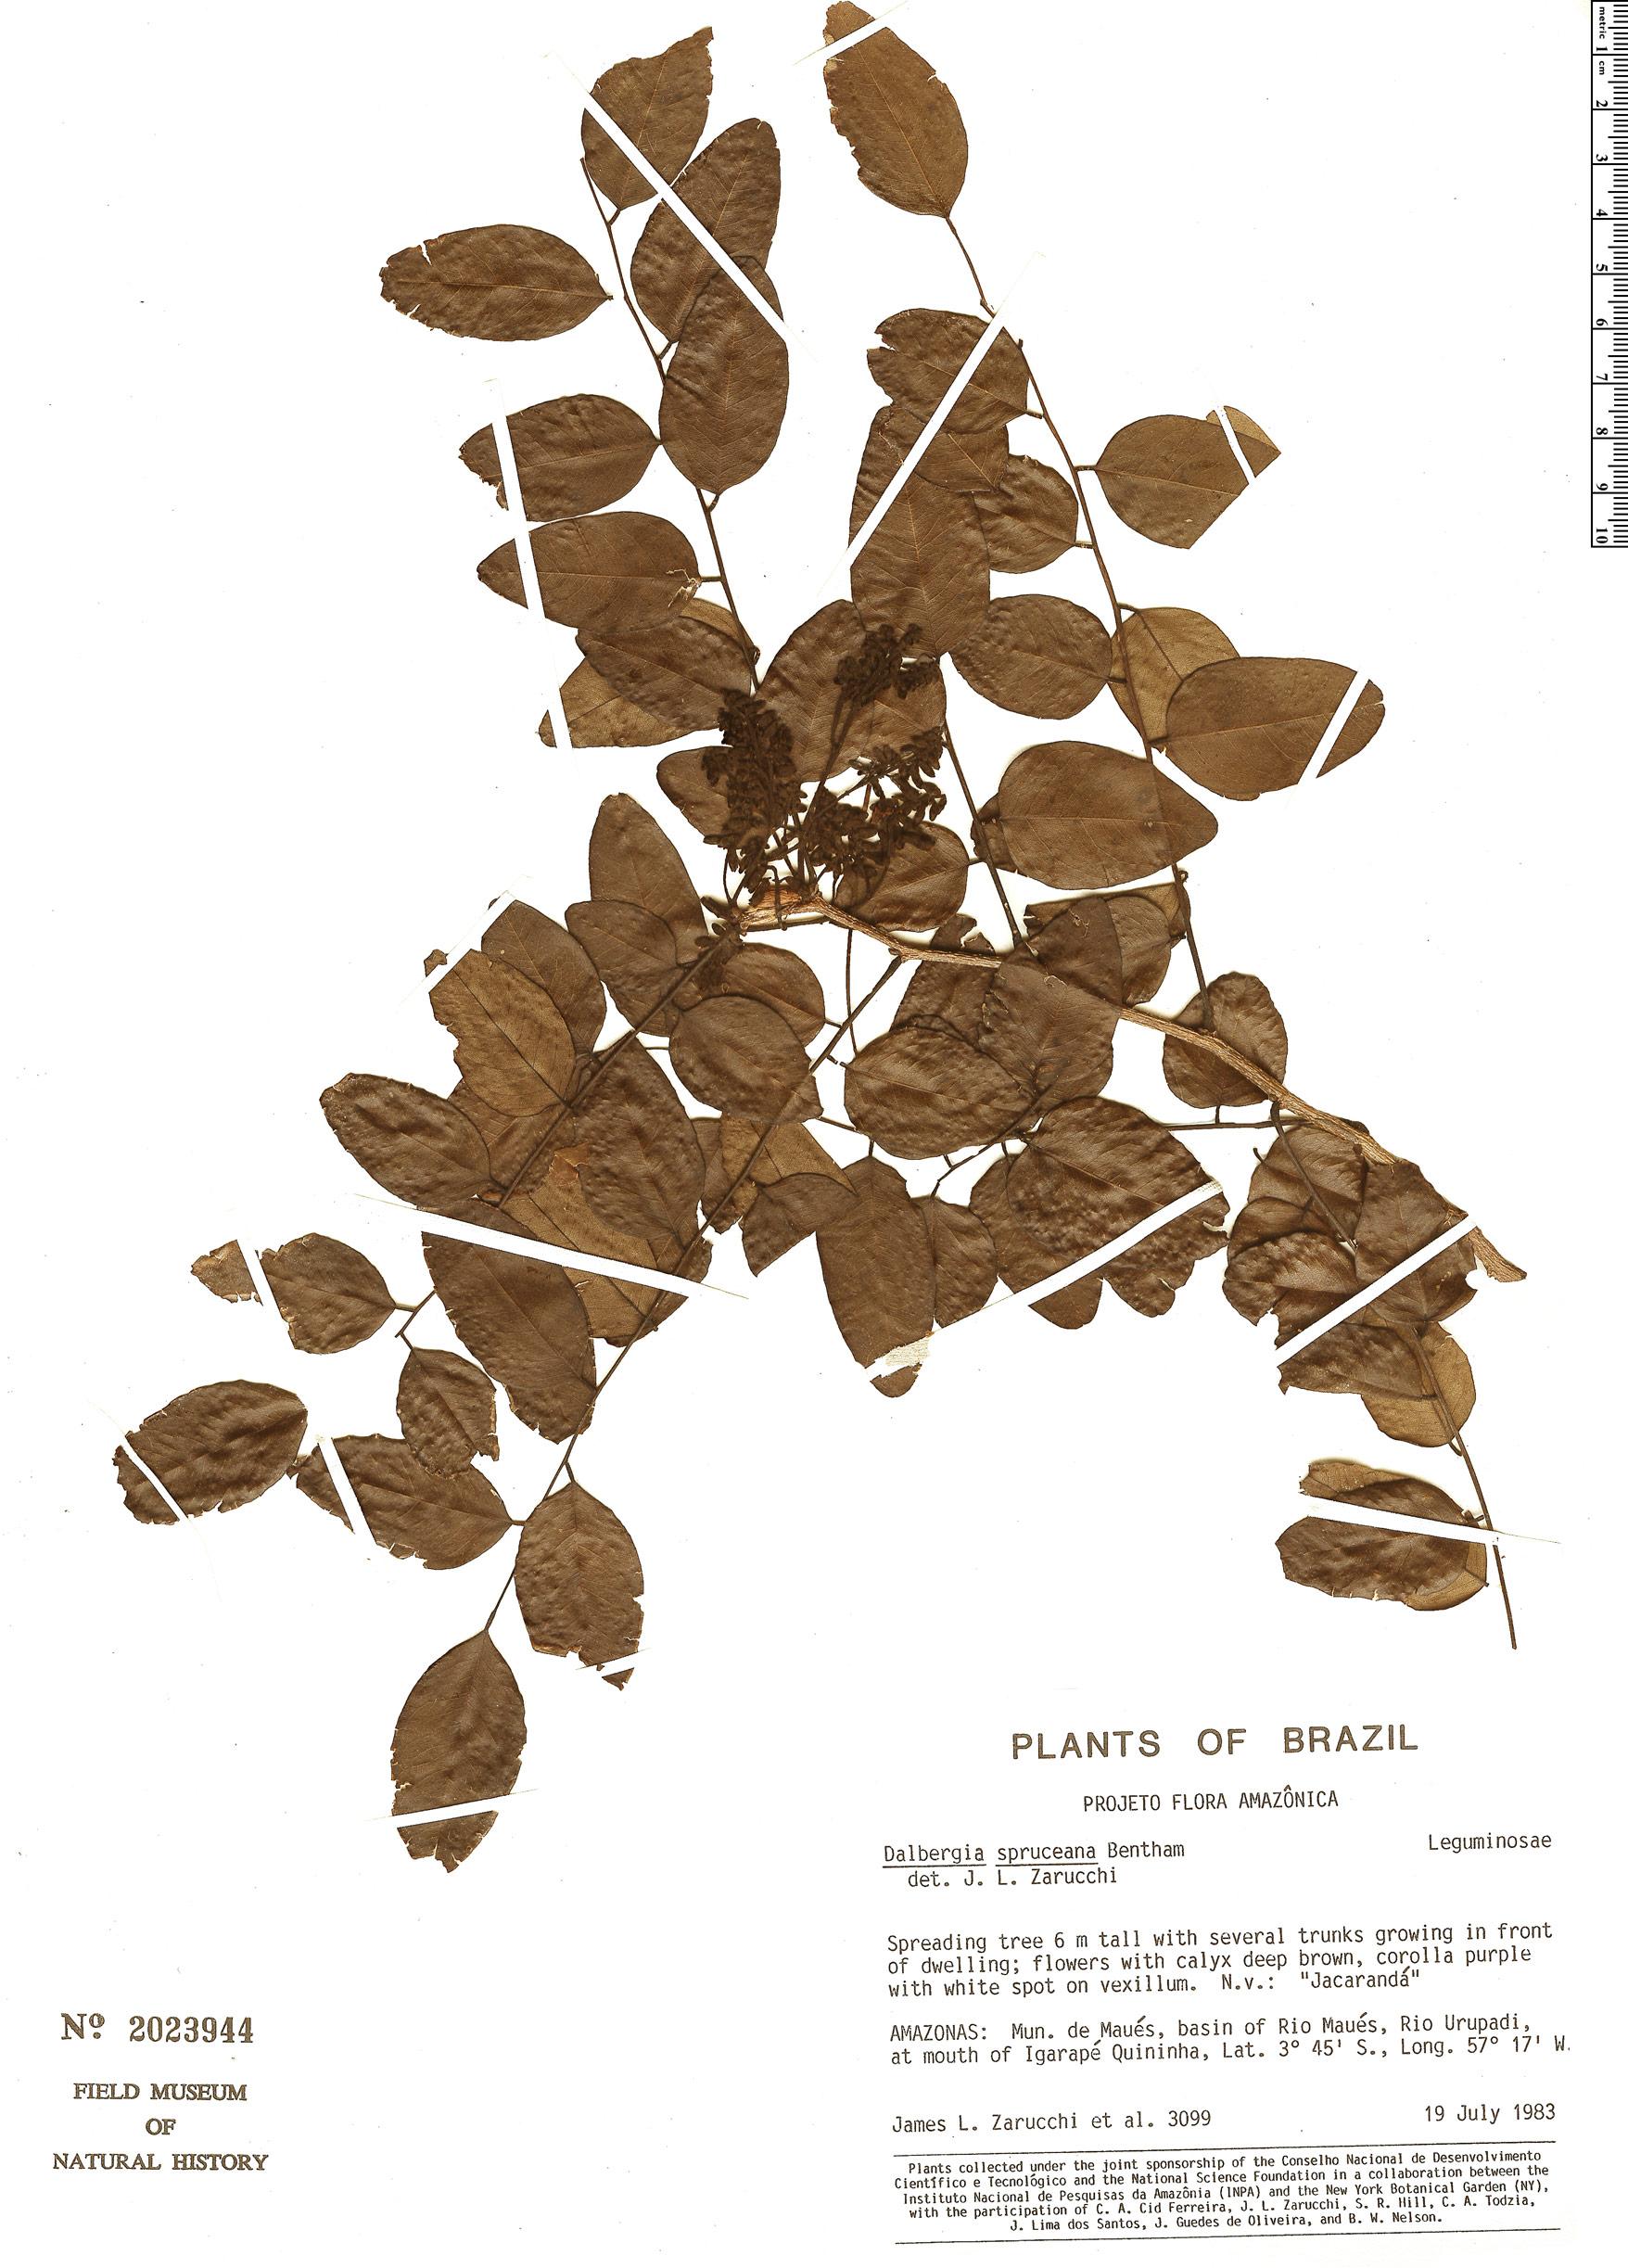 Espécime: Dalbergia spruceana